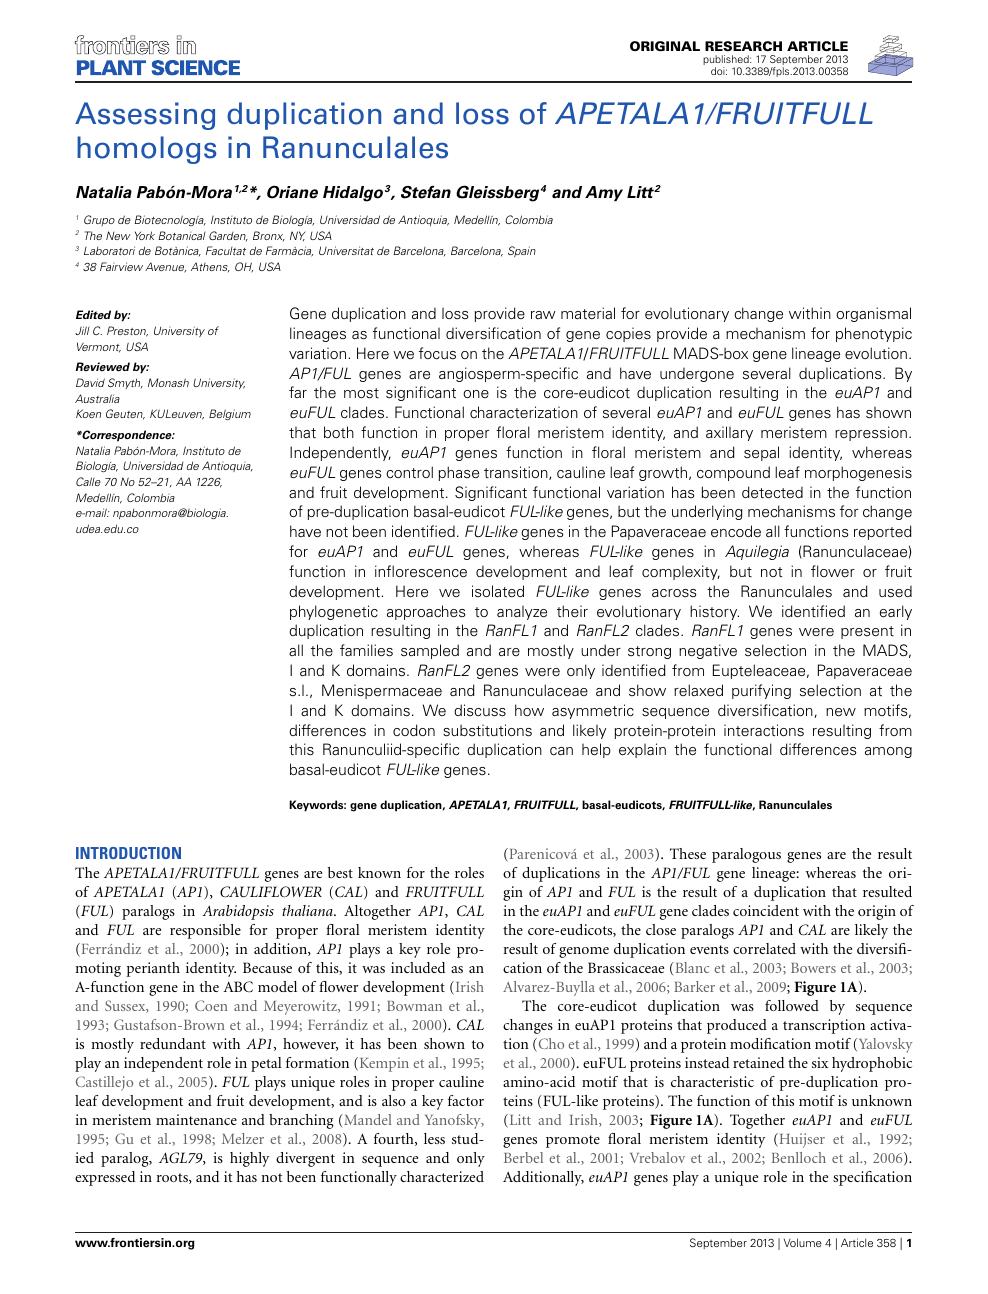 Assessing duplication and loss of APETALA1/FRUITFULL